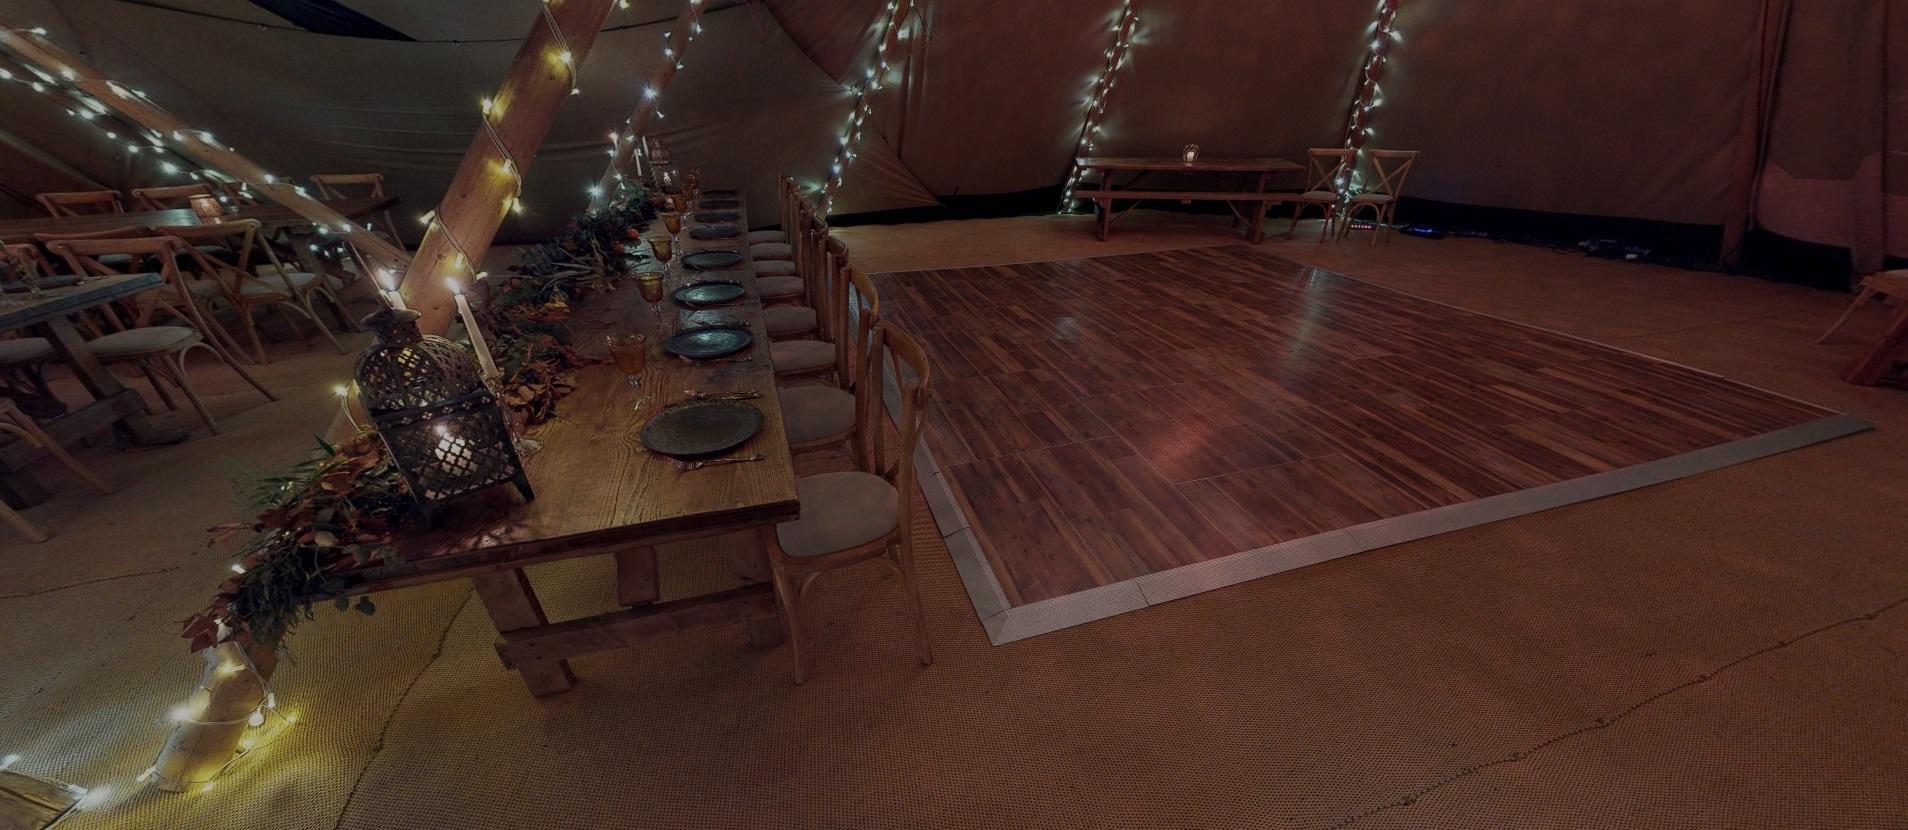 Multilok Vintage Pine Portable Dance Floor - Serentipi